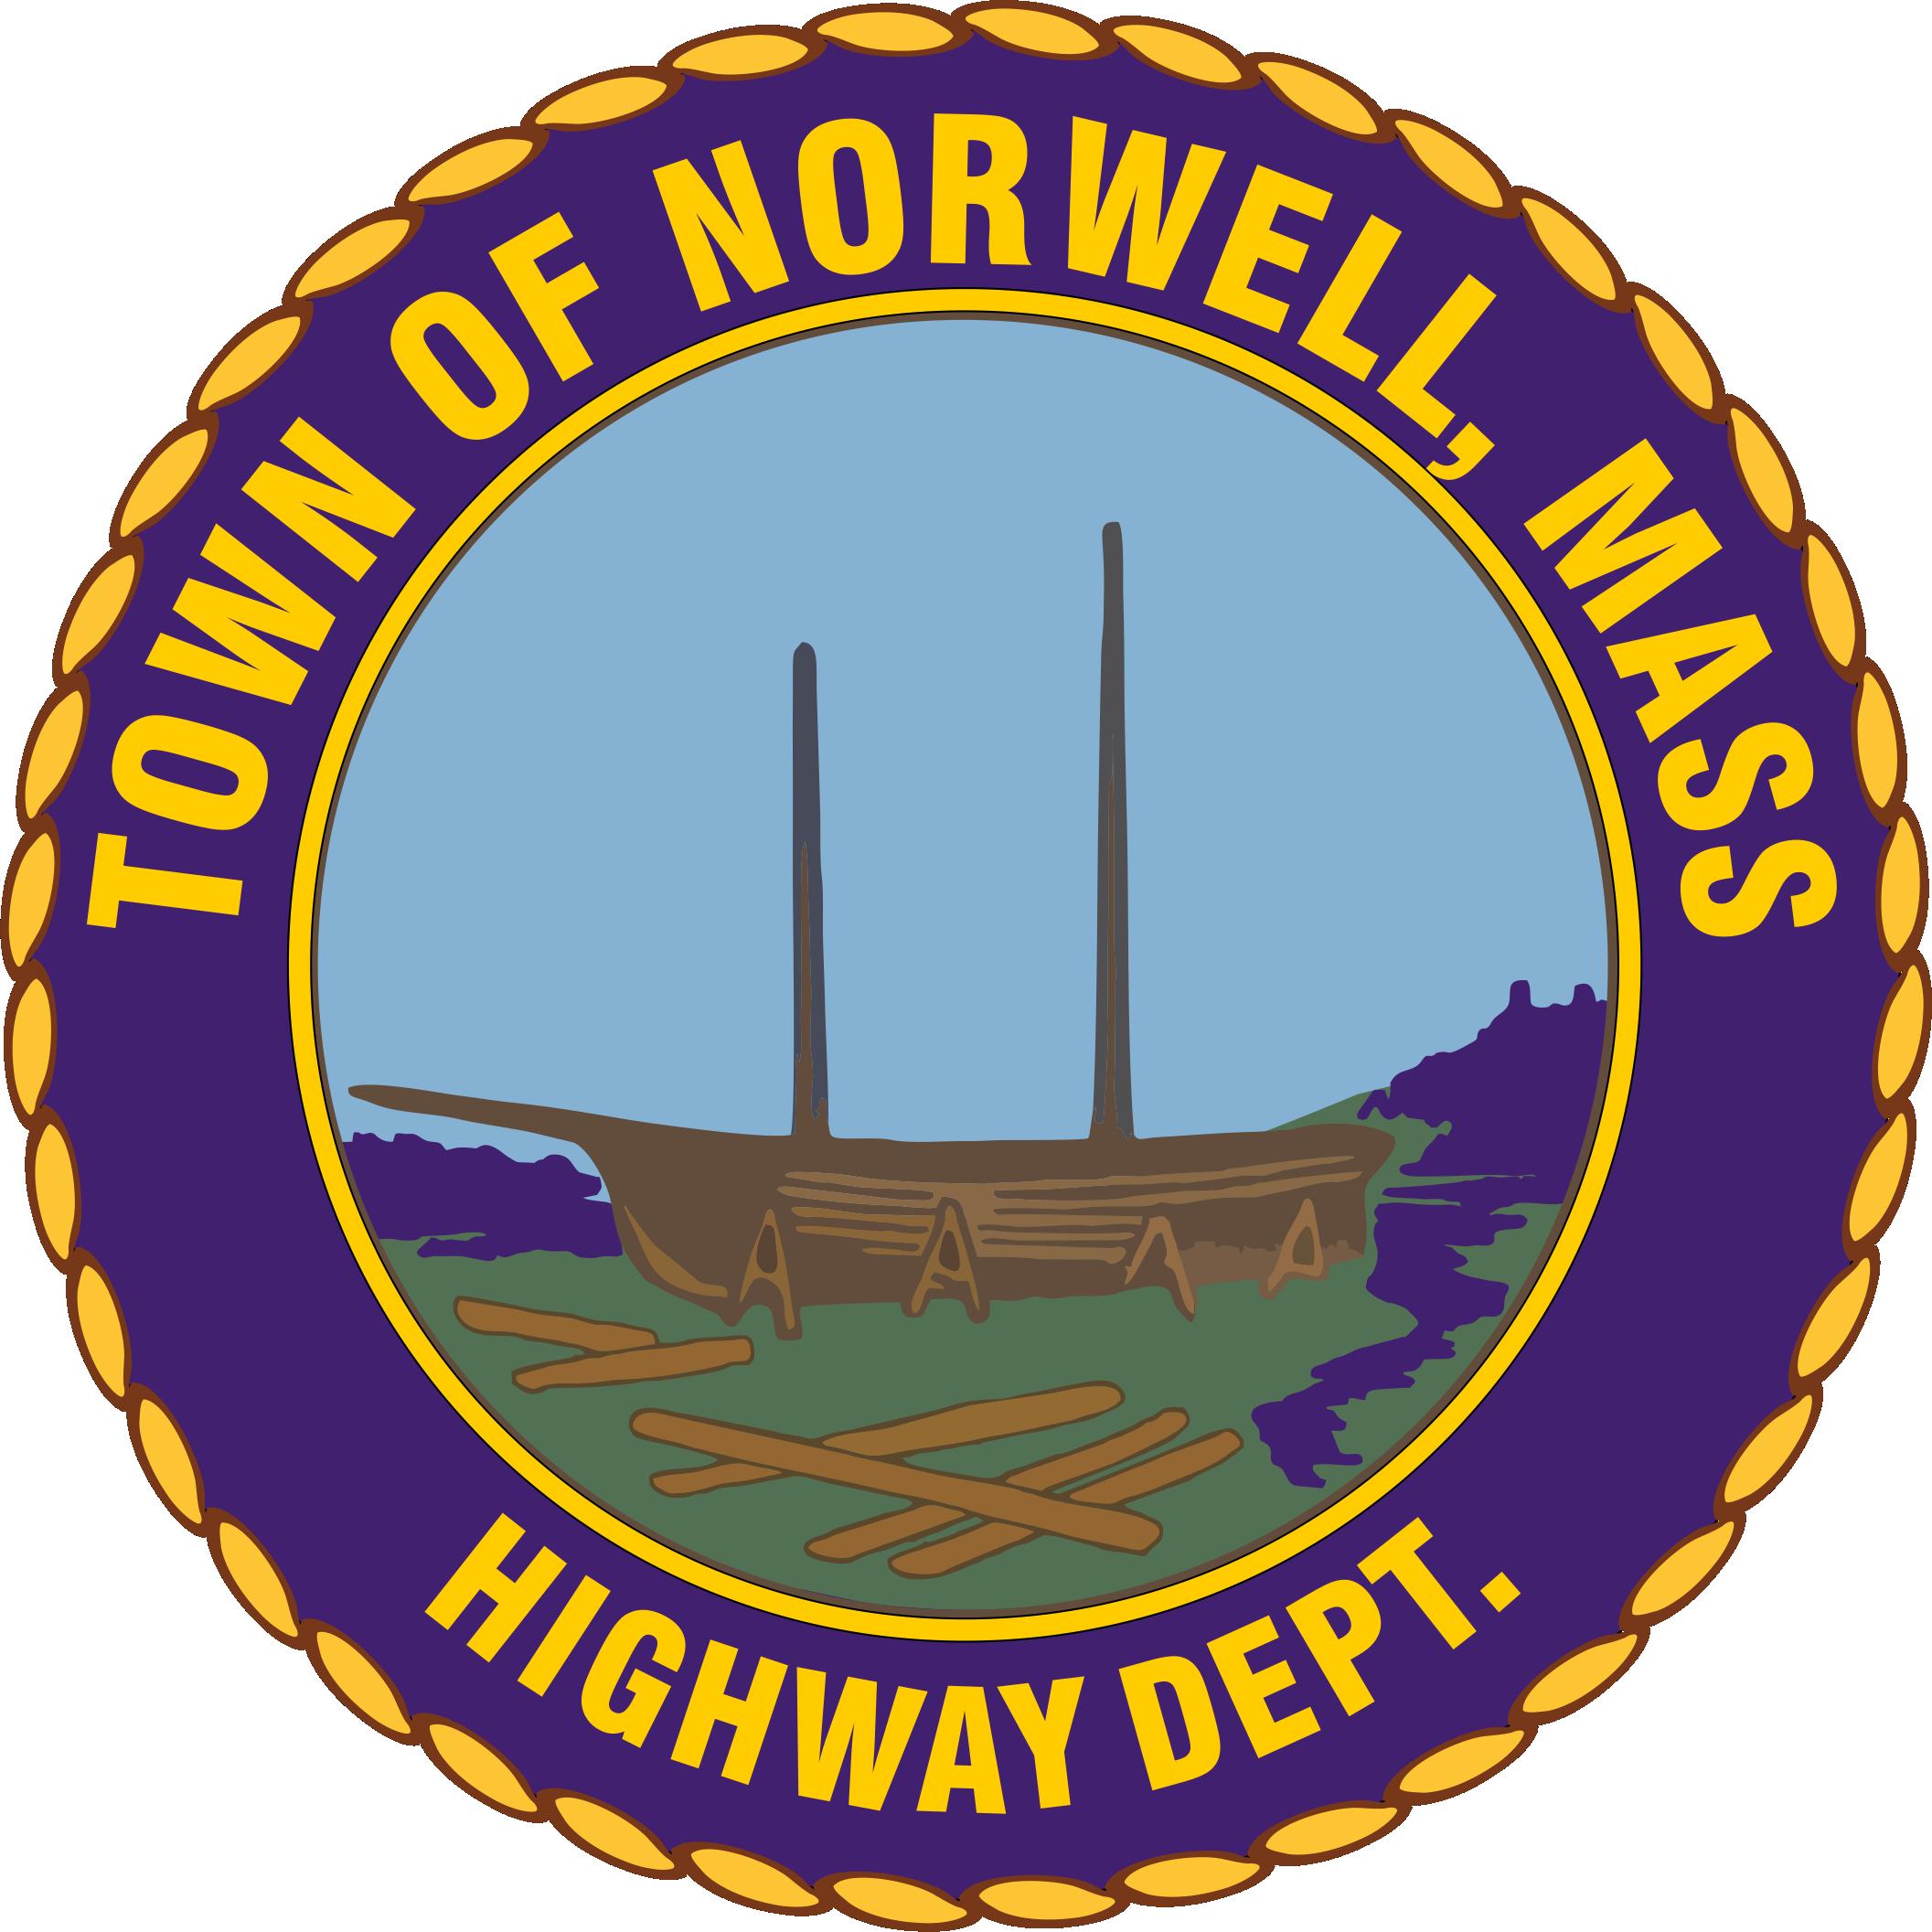 Roads norwell mass . Clipart road scenic drive